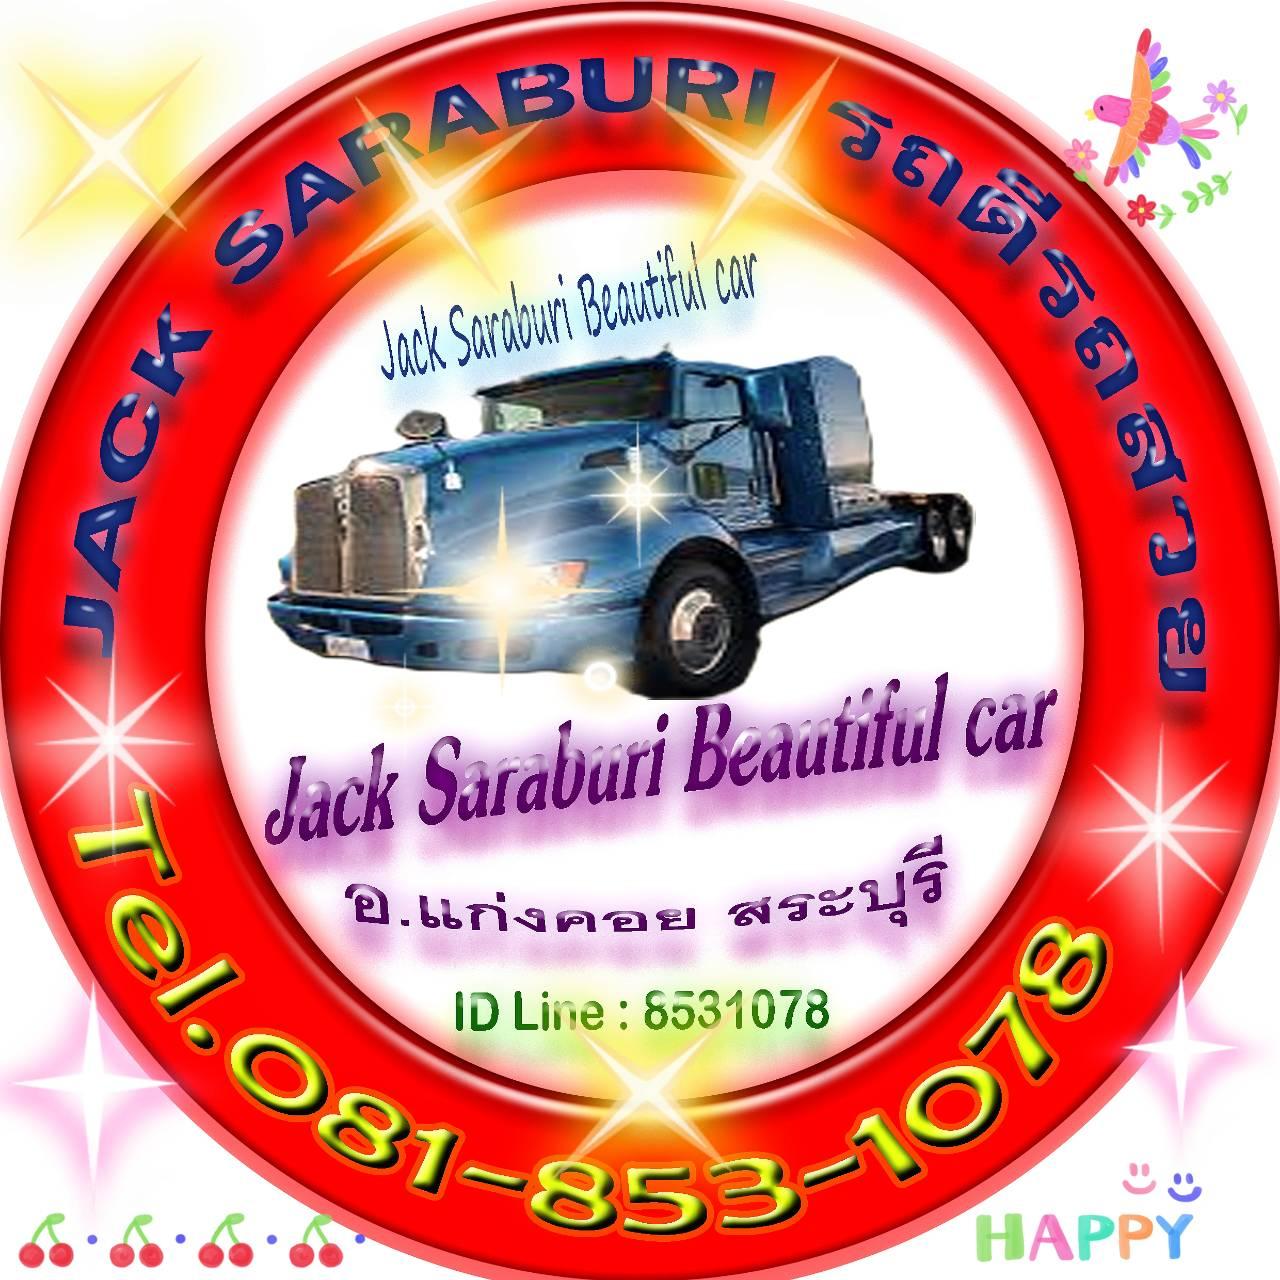 truck2hand profile jack saraburi